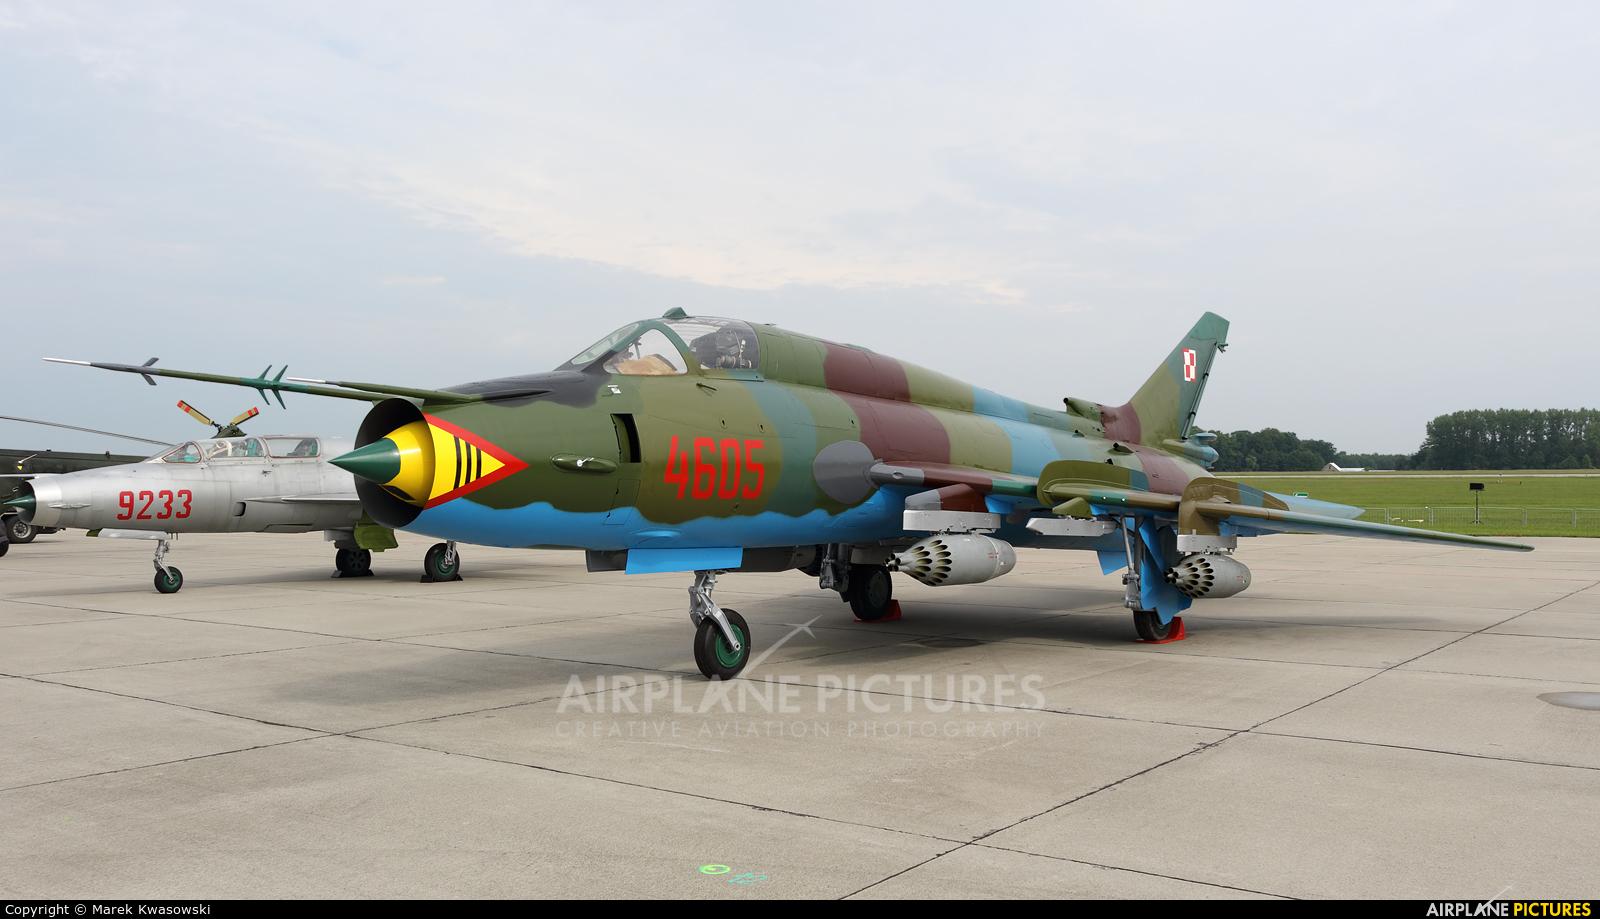 Poland - Air Force 4605 aircraft at Mińsk Mazowiecki